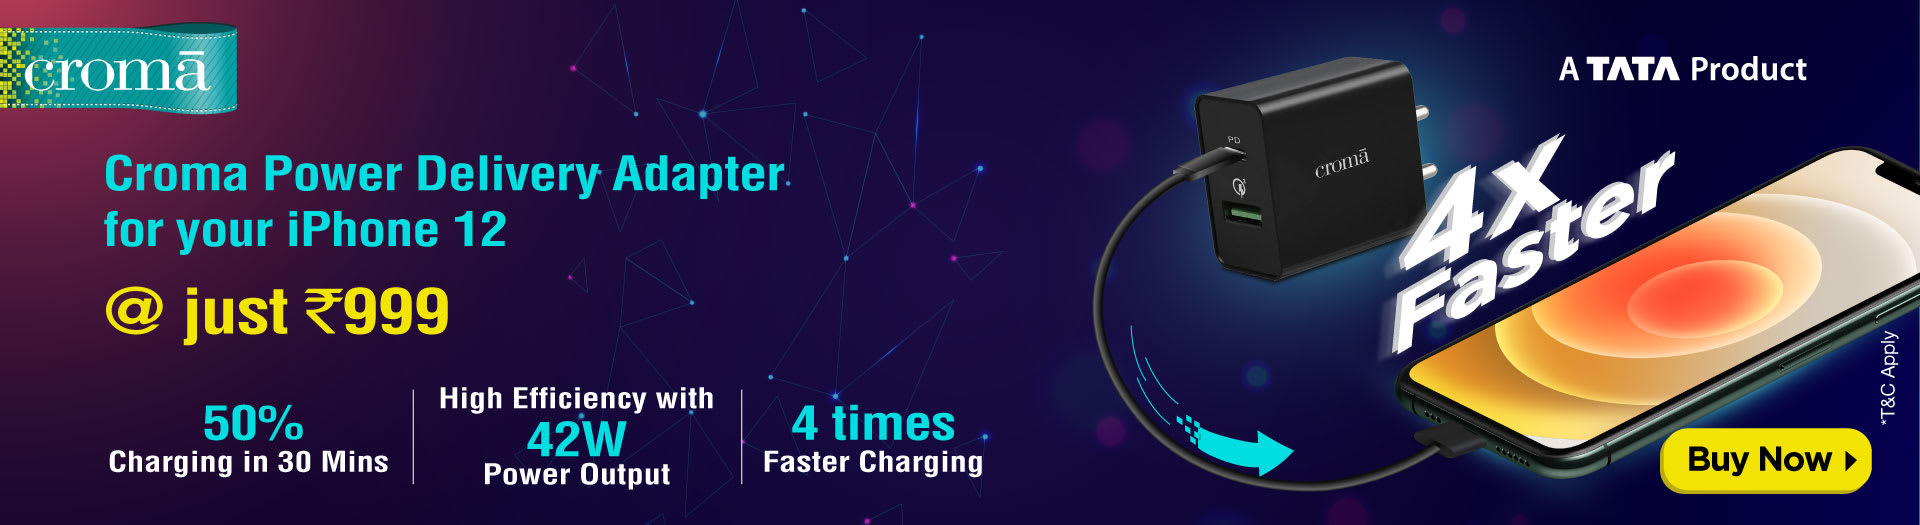 Croma Power Adapter